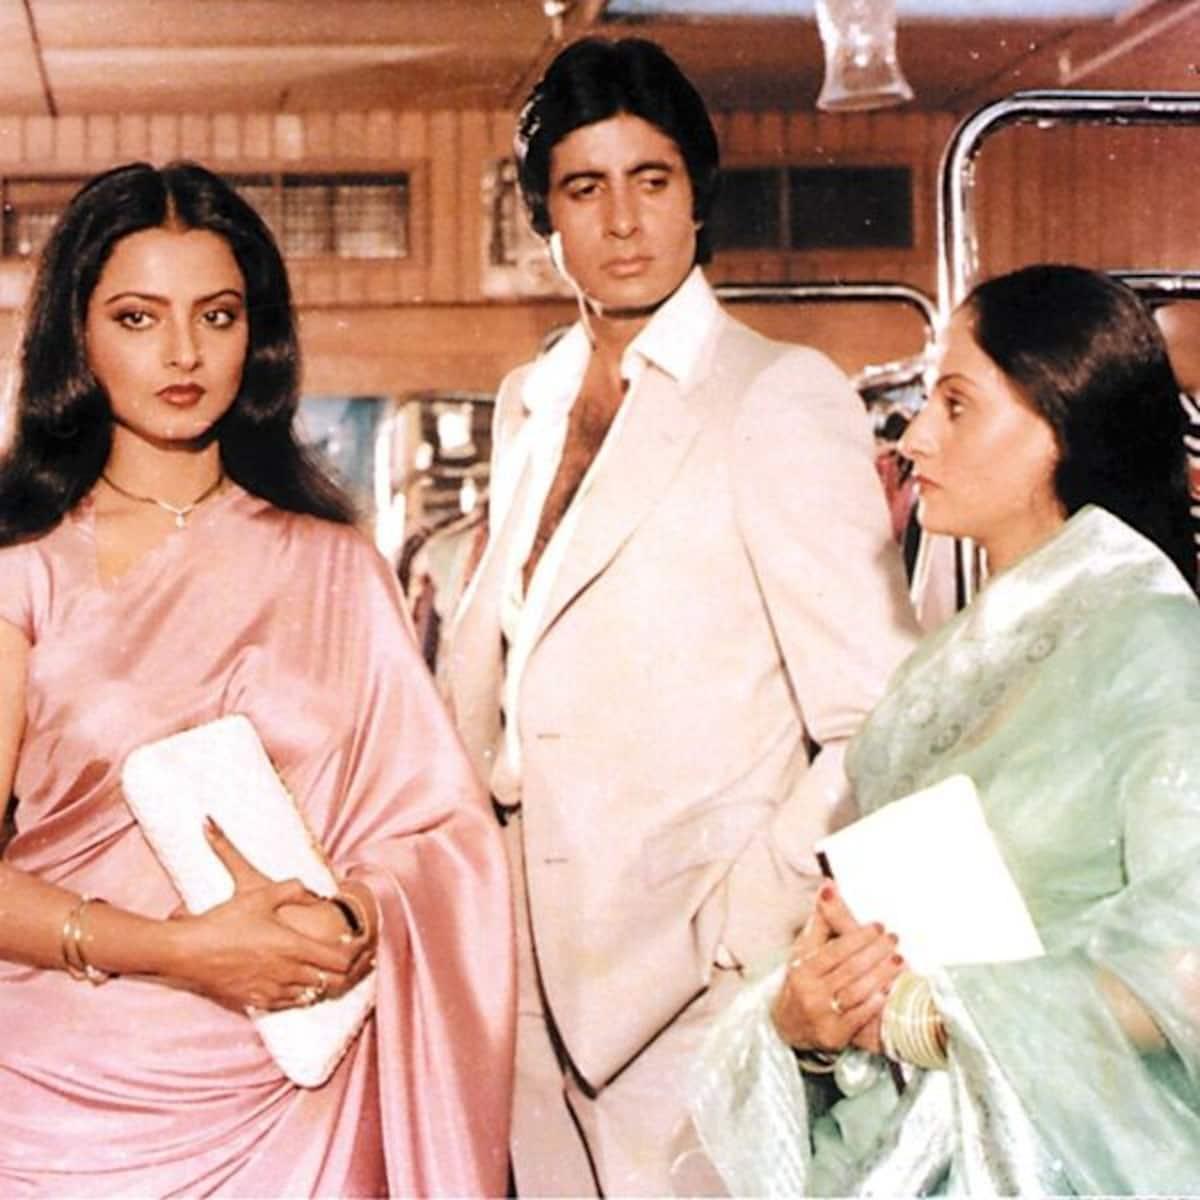 Rekha memes steal Amitabh Bachchan and Jaya Bachchan's wedding anniversary  thunder – view pics